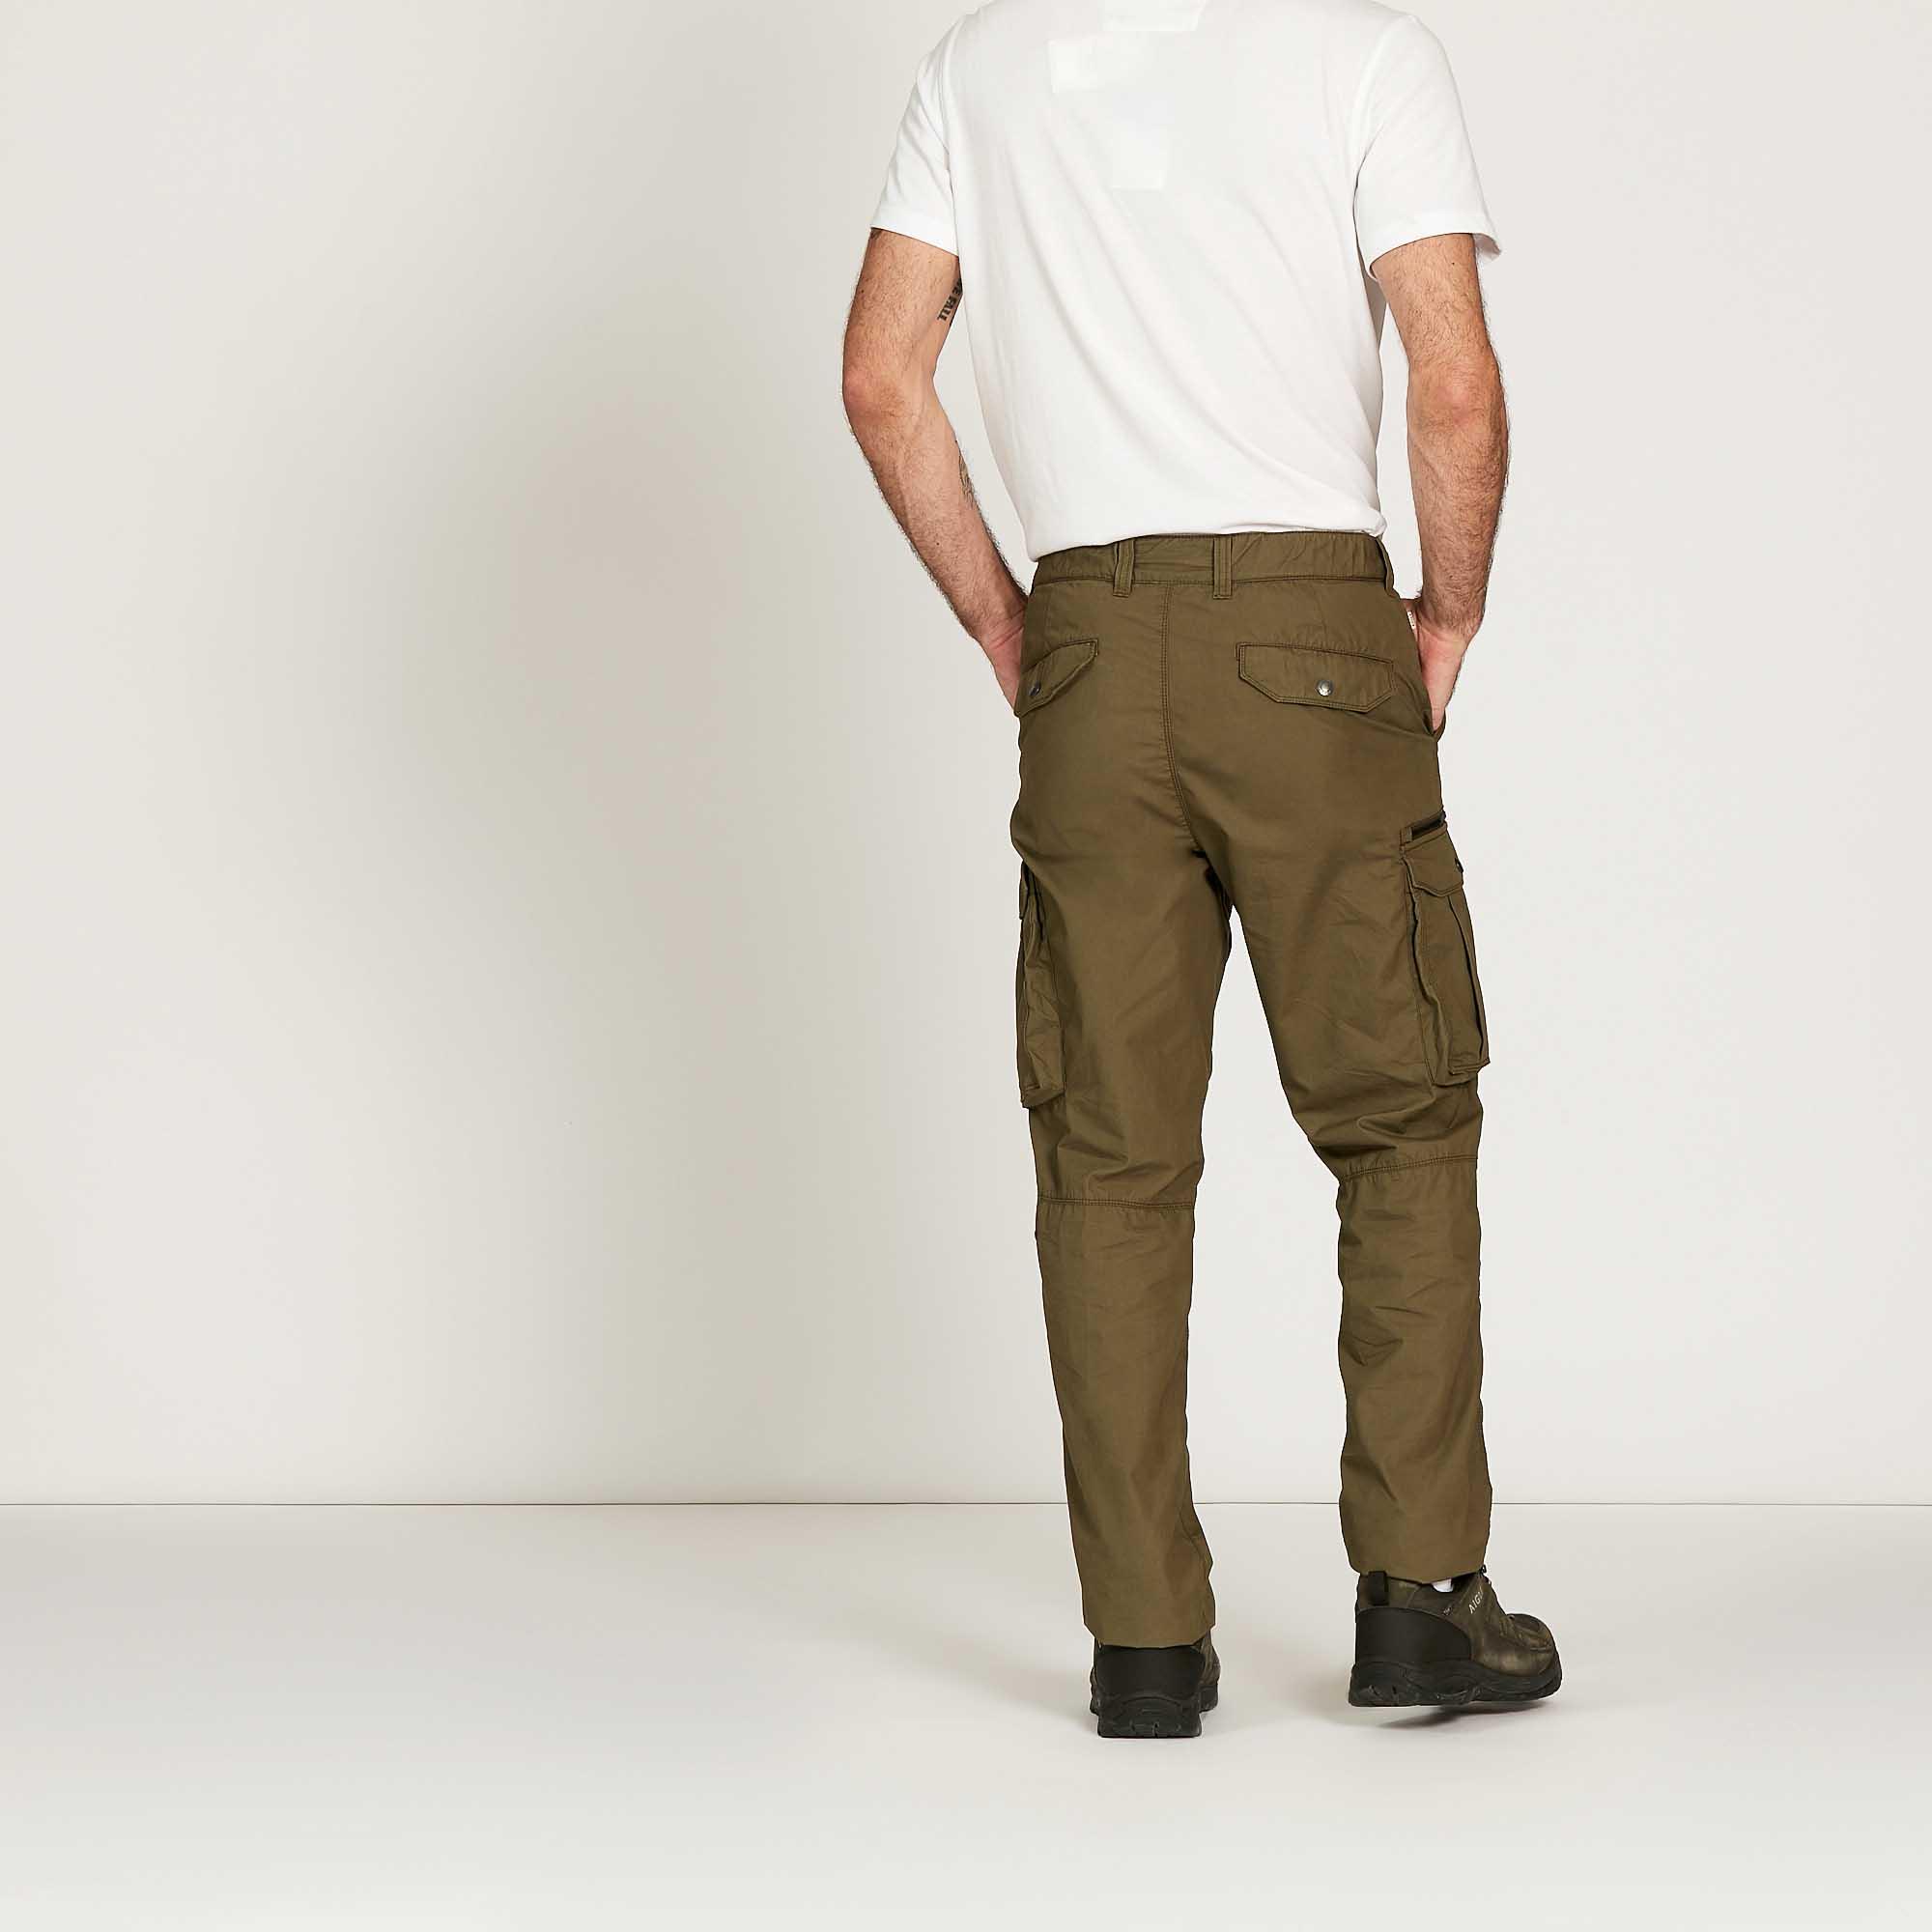 8f0258aced15aa ARCHIONE | Pantalon cargo Homme Classic beige | Aiglehomme | AIGLE